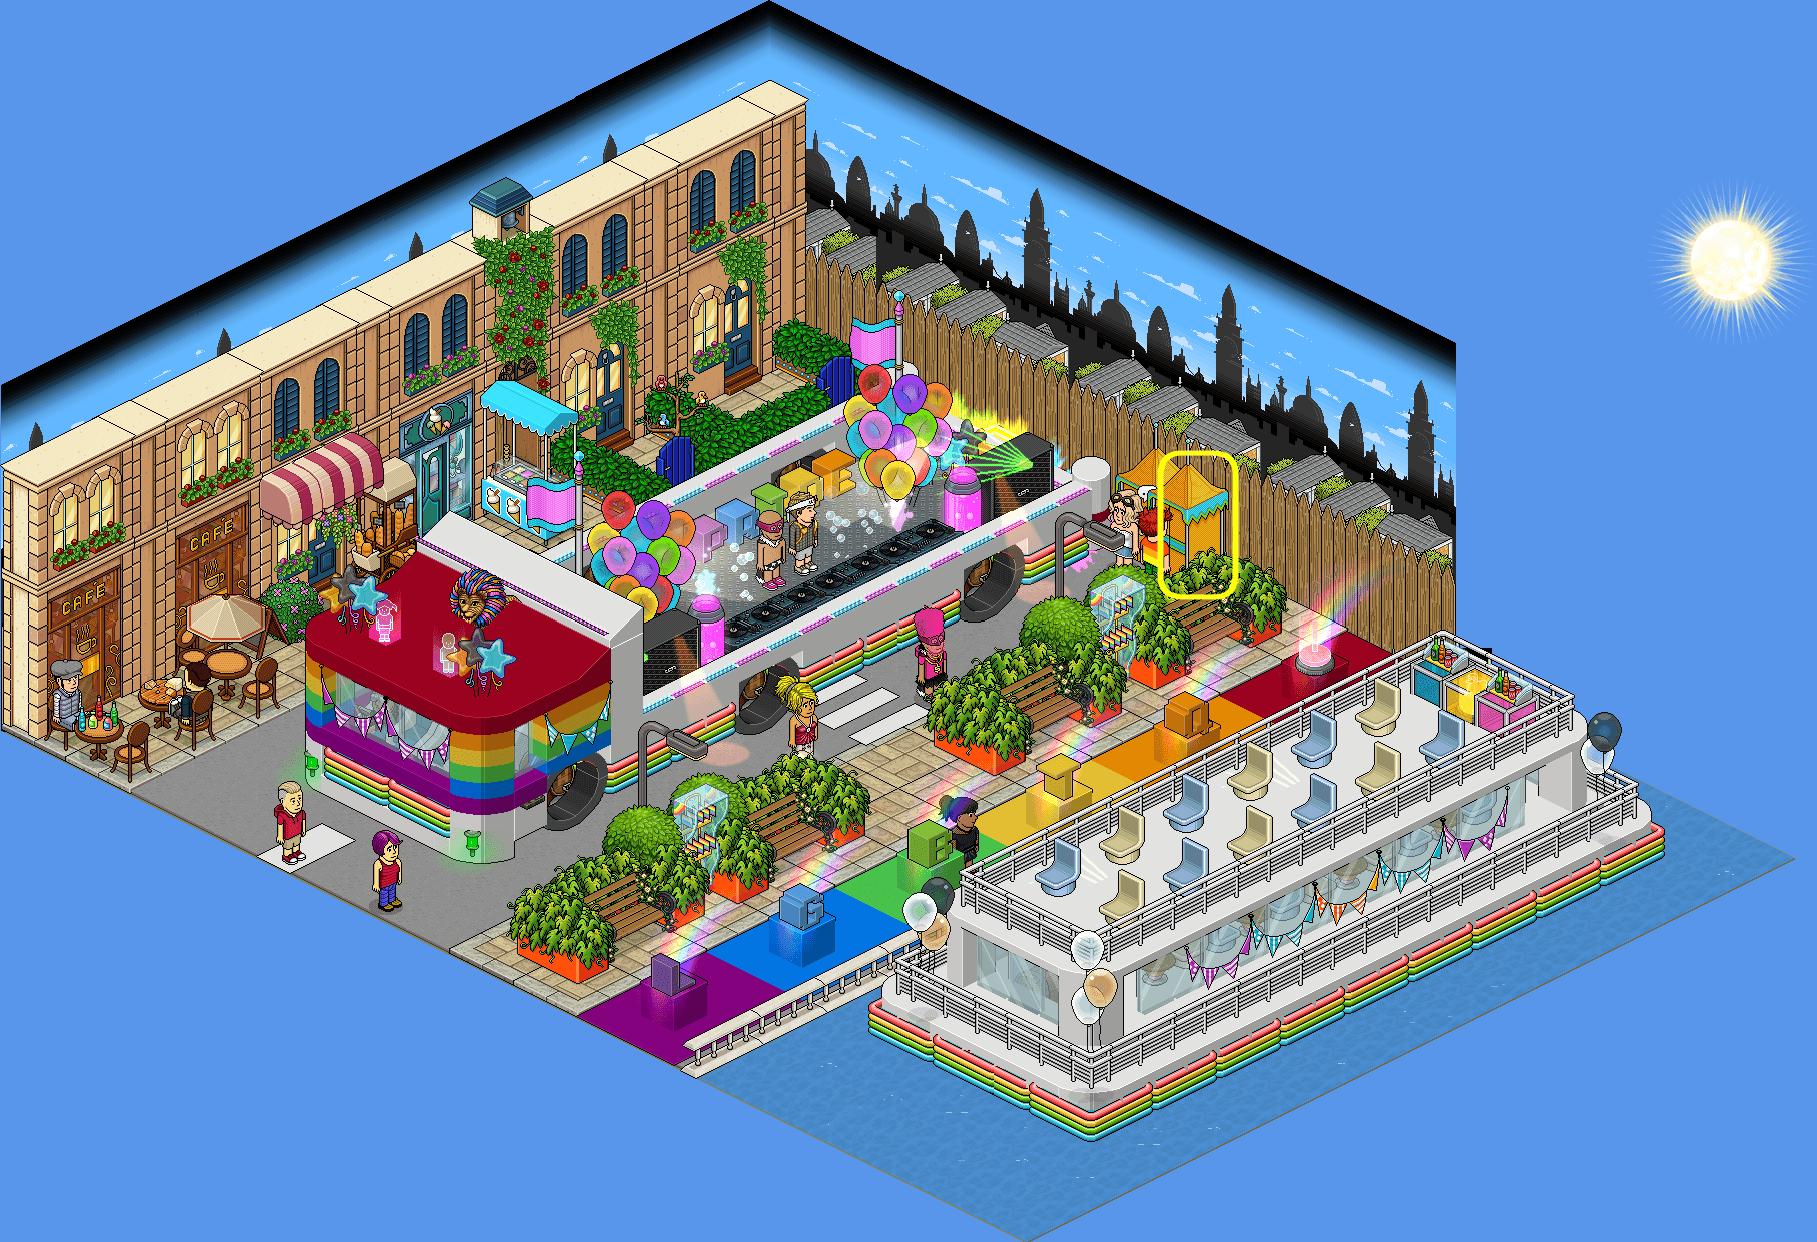 2 - Concours pride